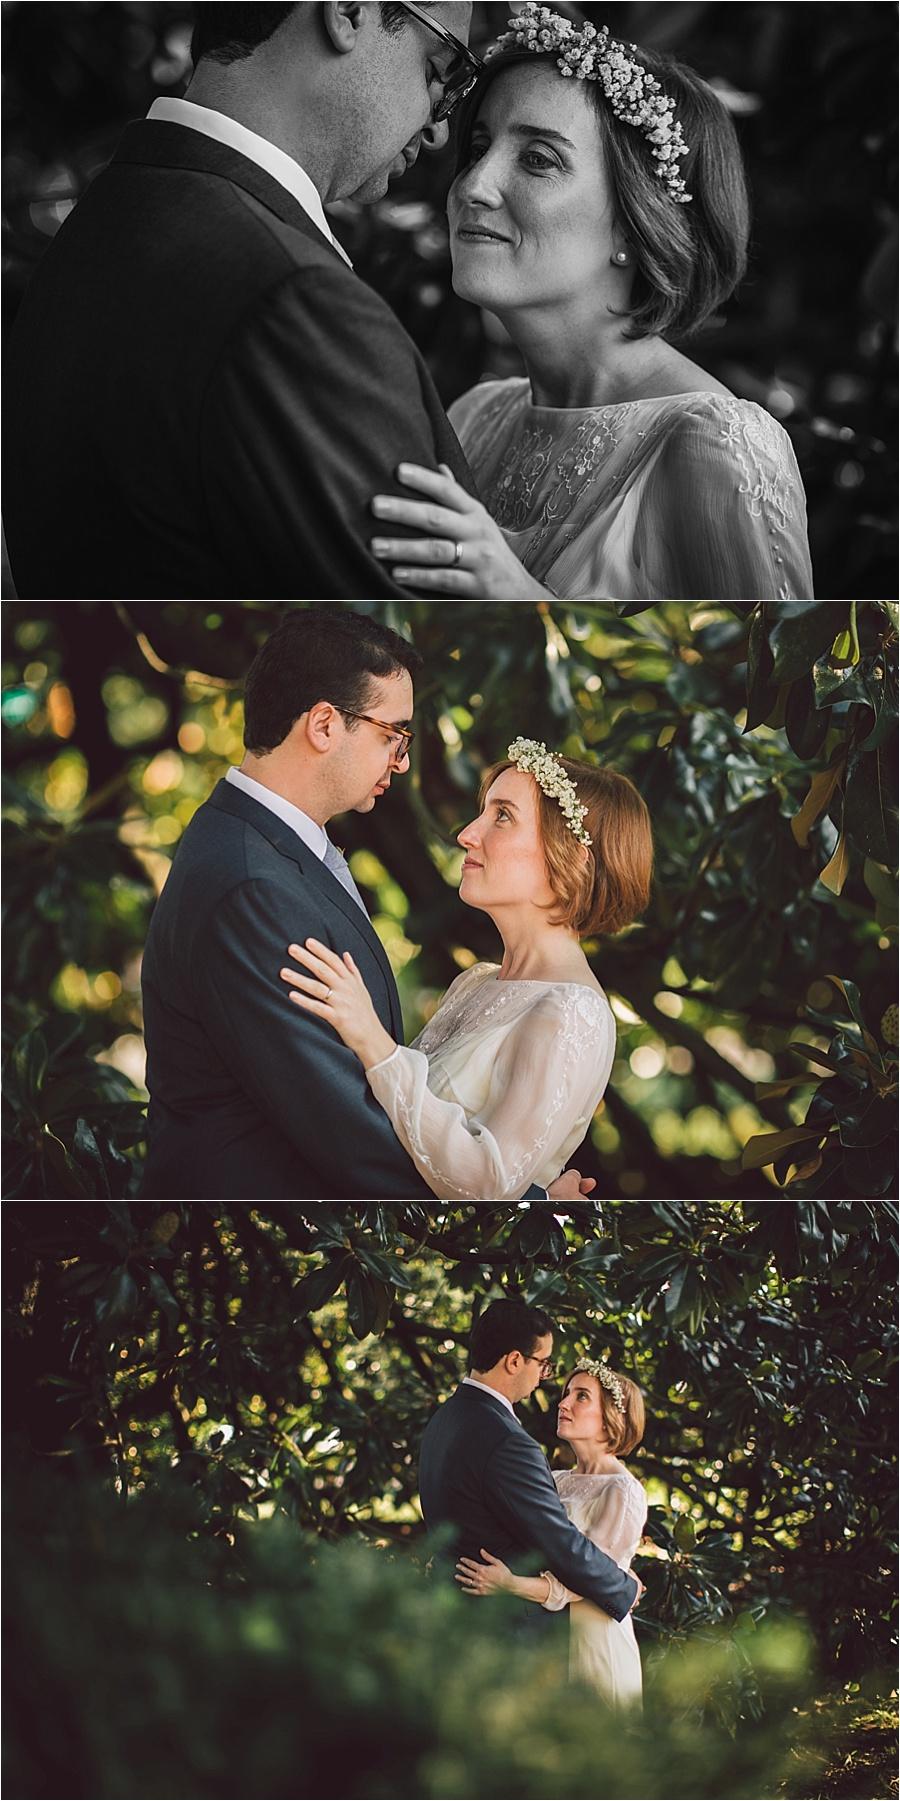 CK-Photo-Nashville-Wedding-Photographer-b_0092.jpg